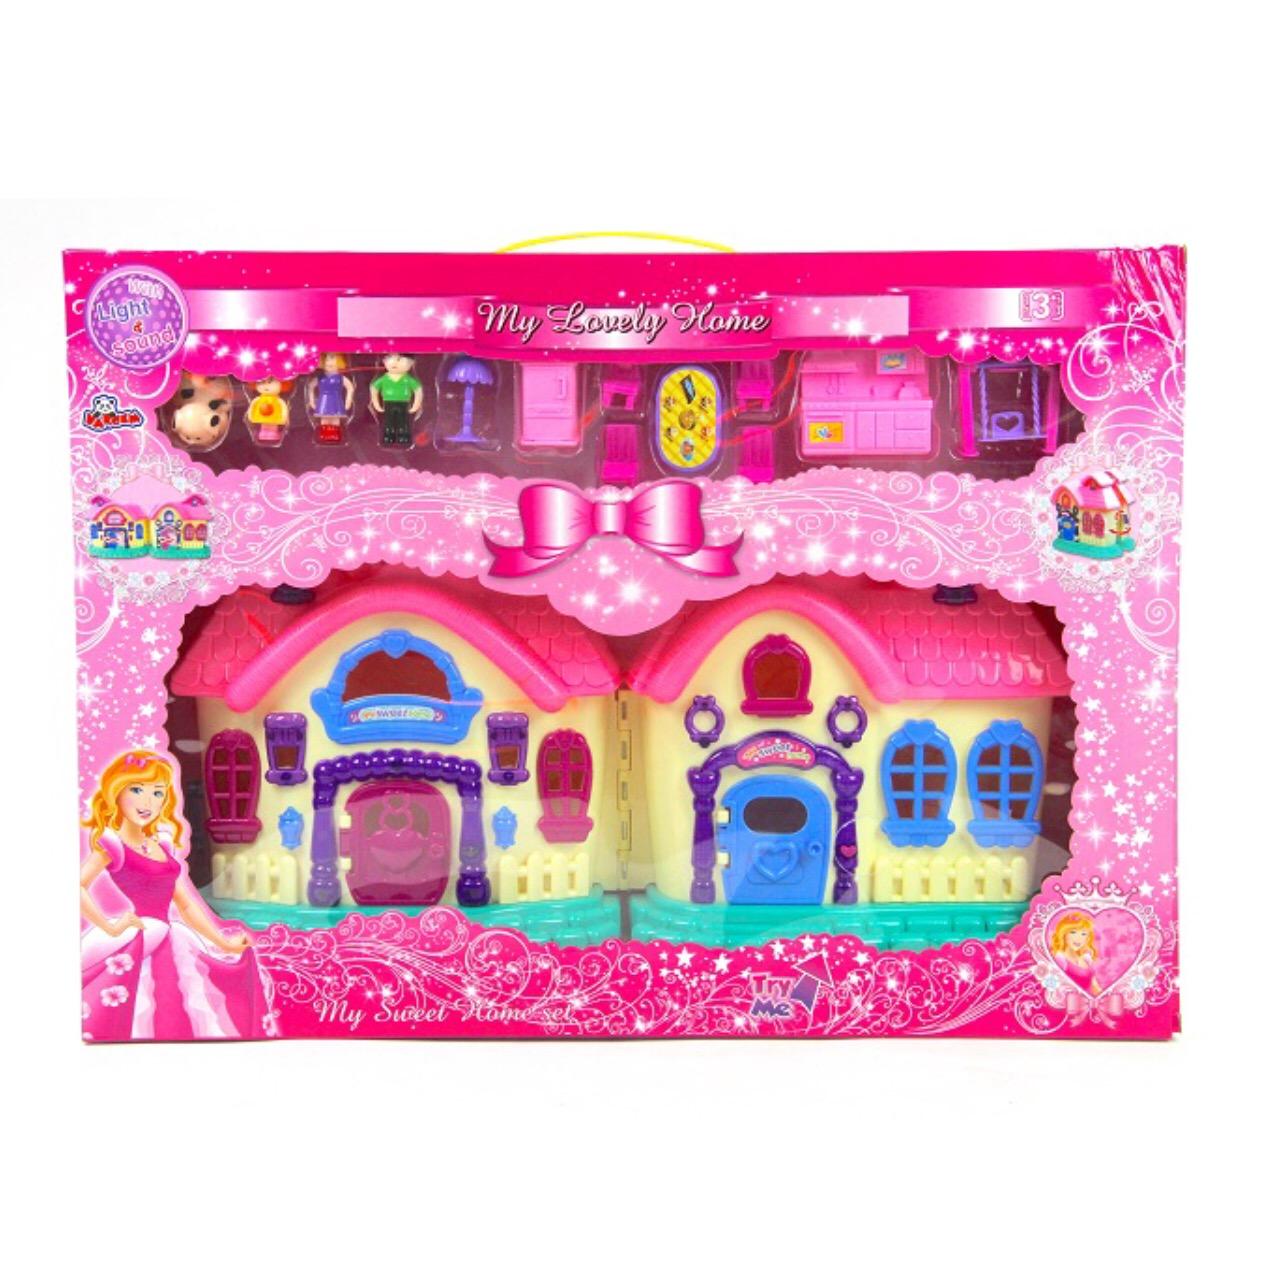 اسباب بازی خانه عروسک مدل My lovely home